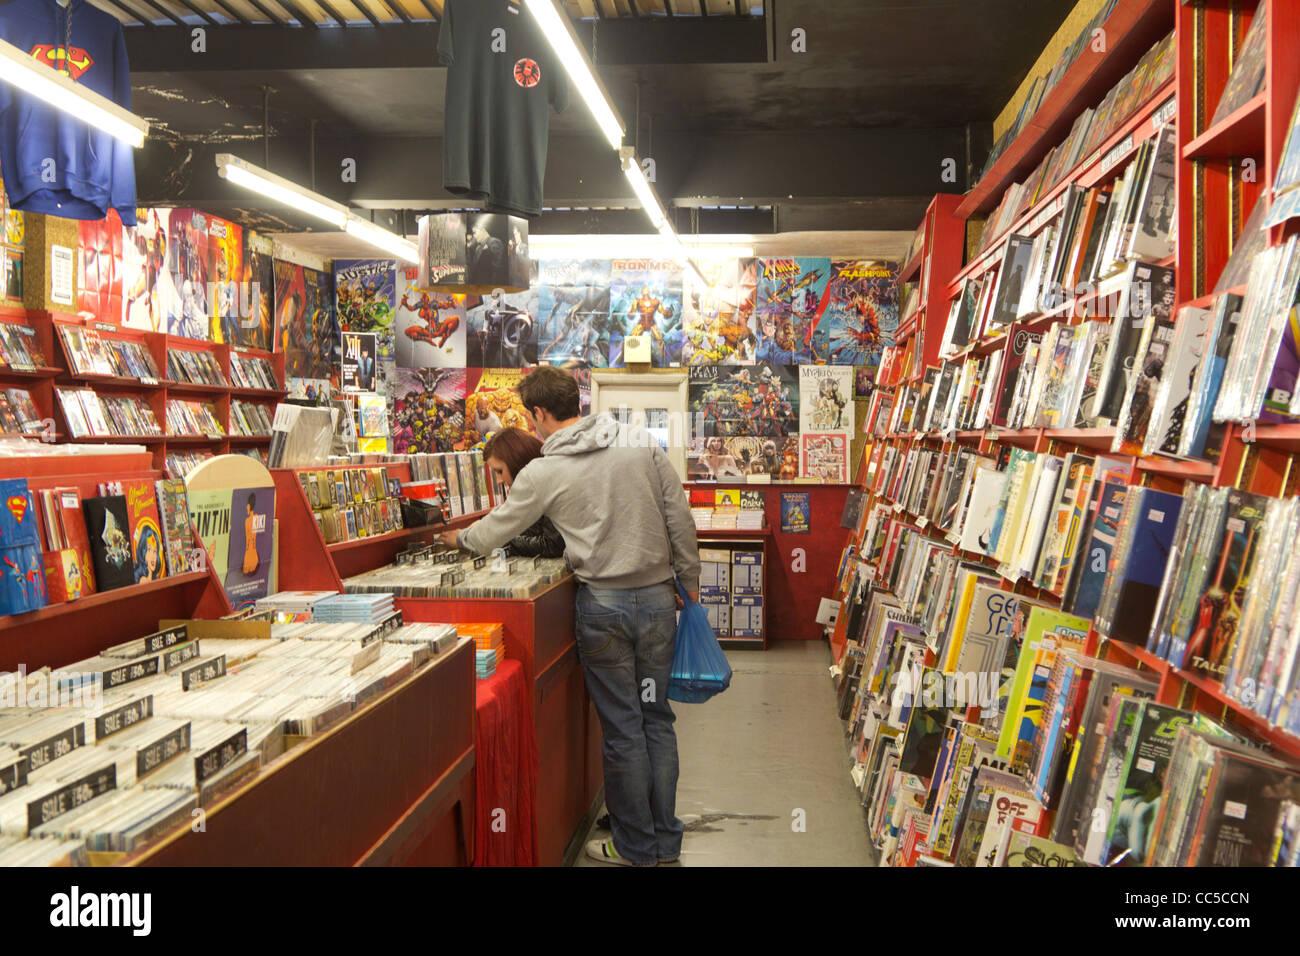 Mega-City Comics - Comic Bookstore - Camden - London - Stock Image